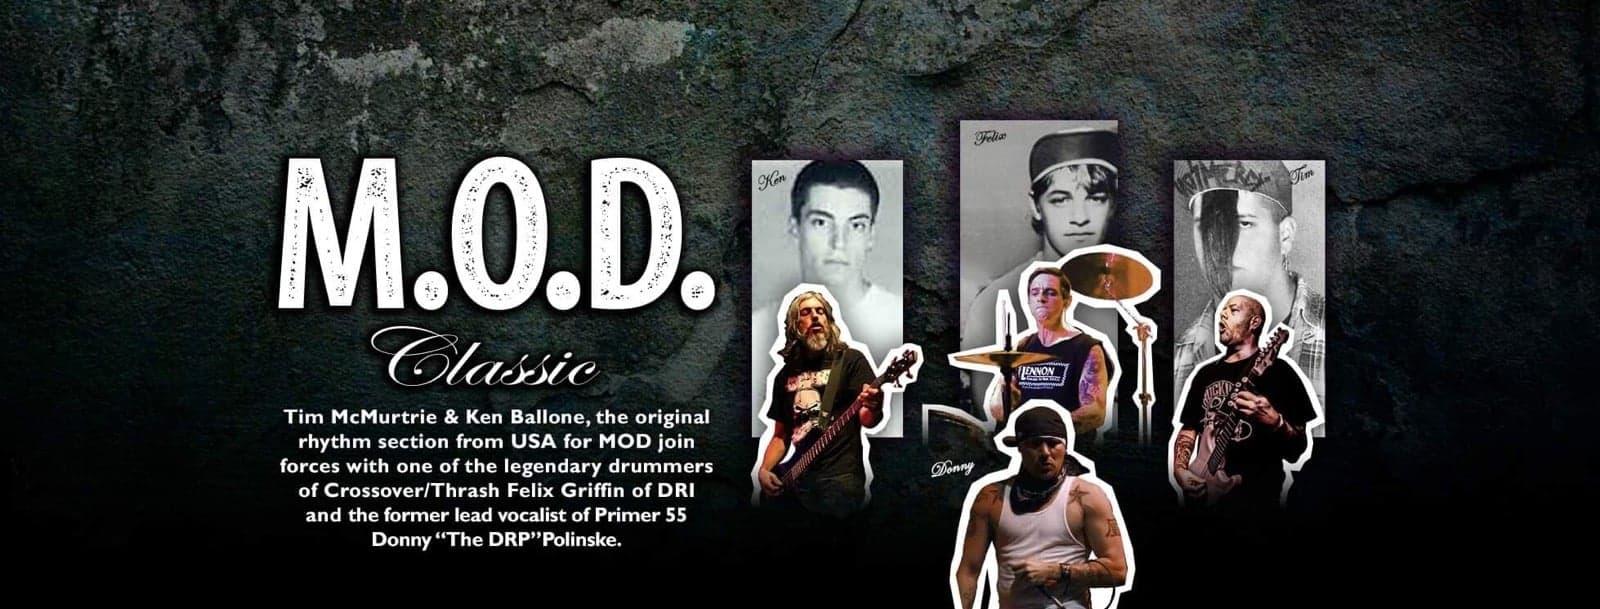 M.O.D. Classic Official Merchandise